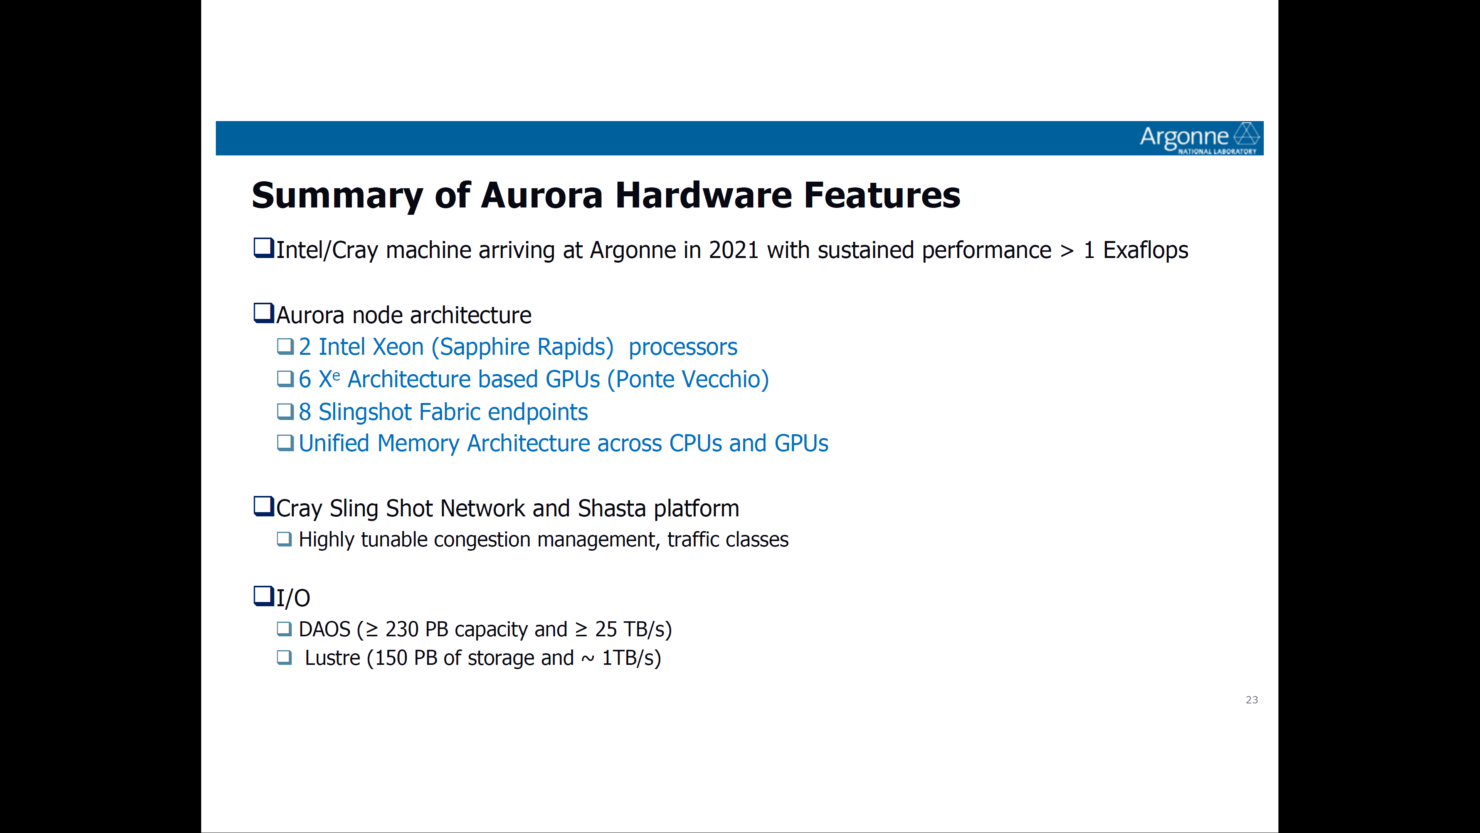 intel-aurora-supercomputer_xe-hpc-ponte-vecchio-7nm-gpu_sapphire-rapids-xeon-10nm-cpus_14